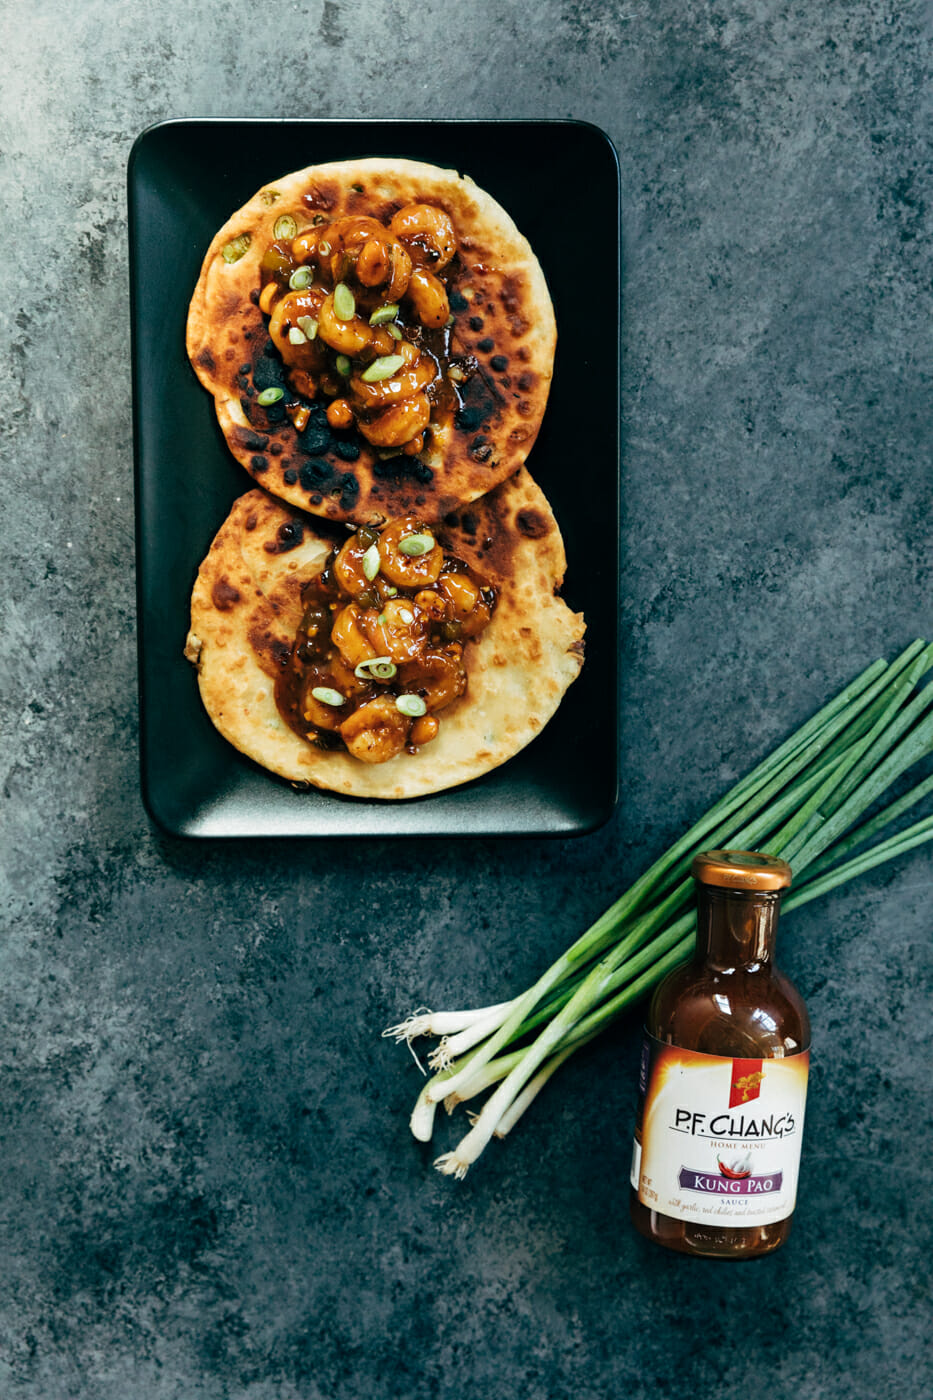 P.F. Chang's® Home Menu Kung Pao Shrimp Tacos